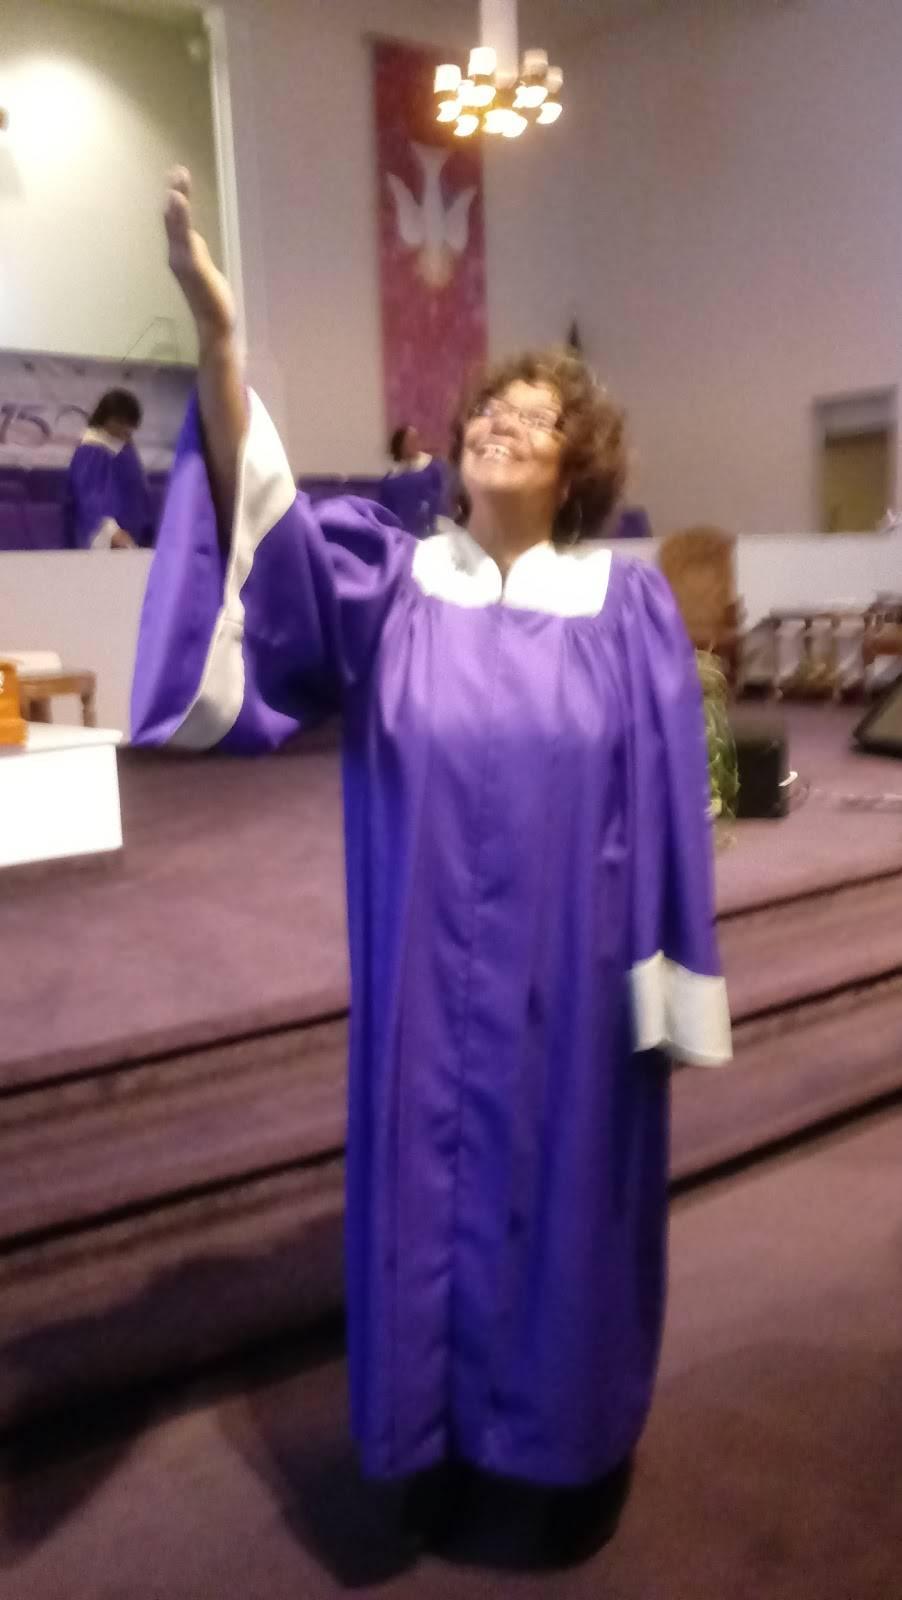 Pleasant Green Baptist Church - church  | Photo 4 of 4 | Address: 340 David L Gray Dr, Kansas City, KS 66101, USA | Phone: (913) 371-5393